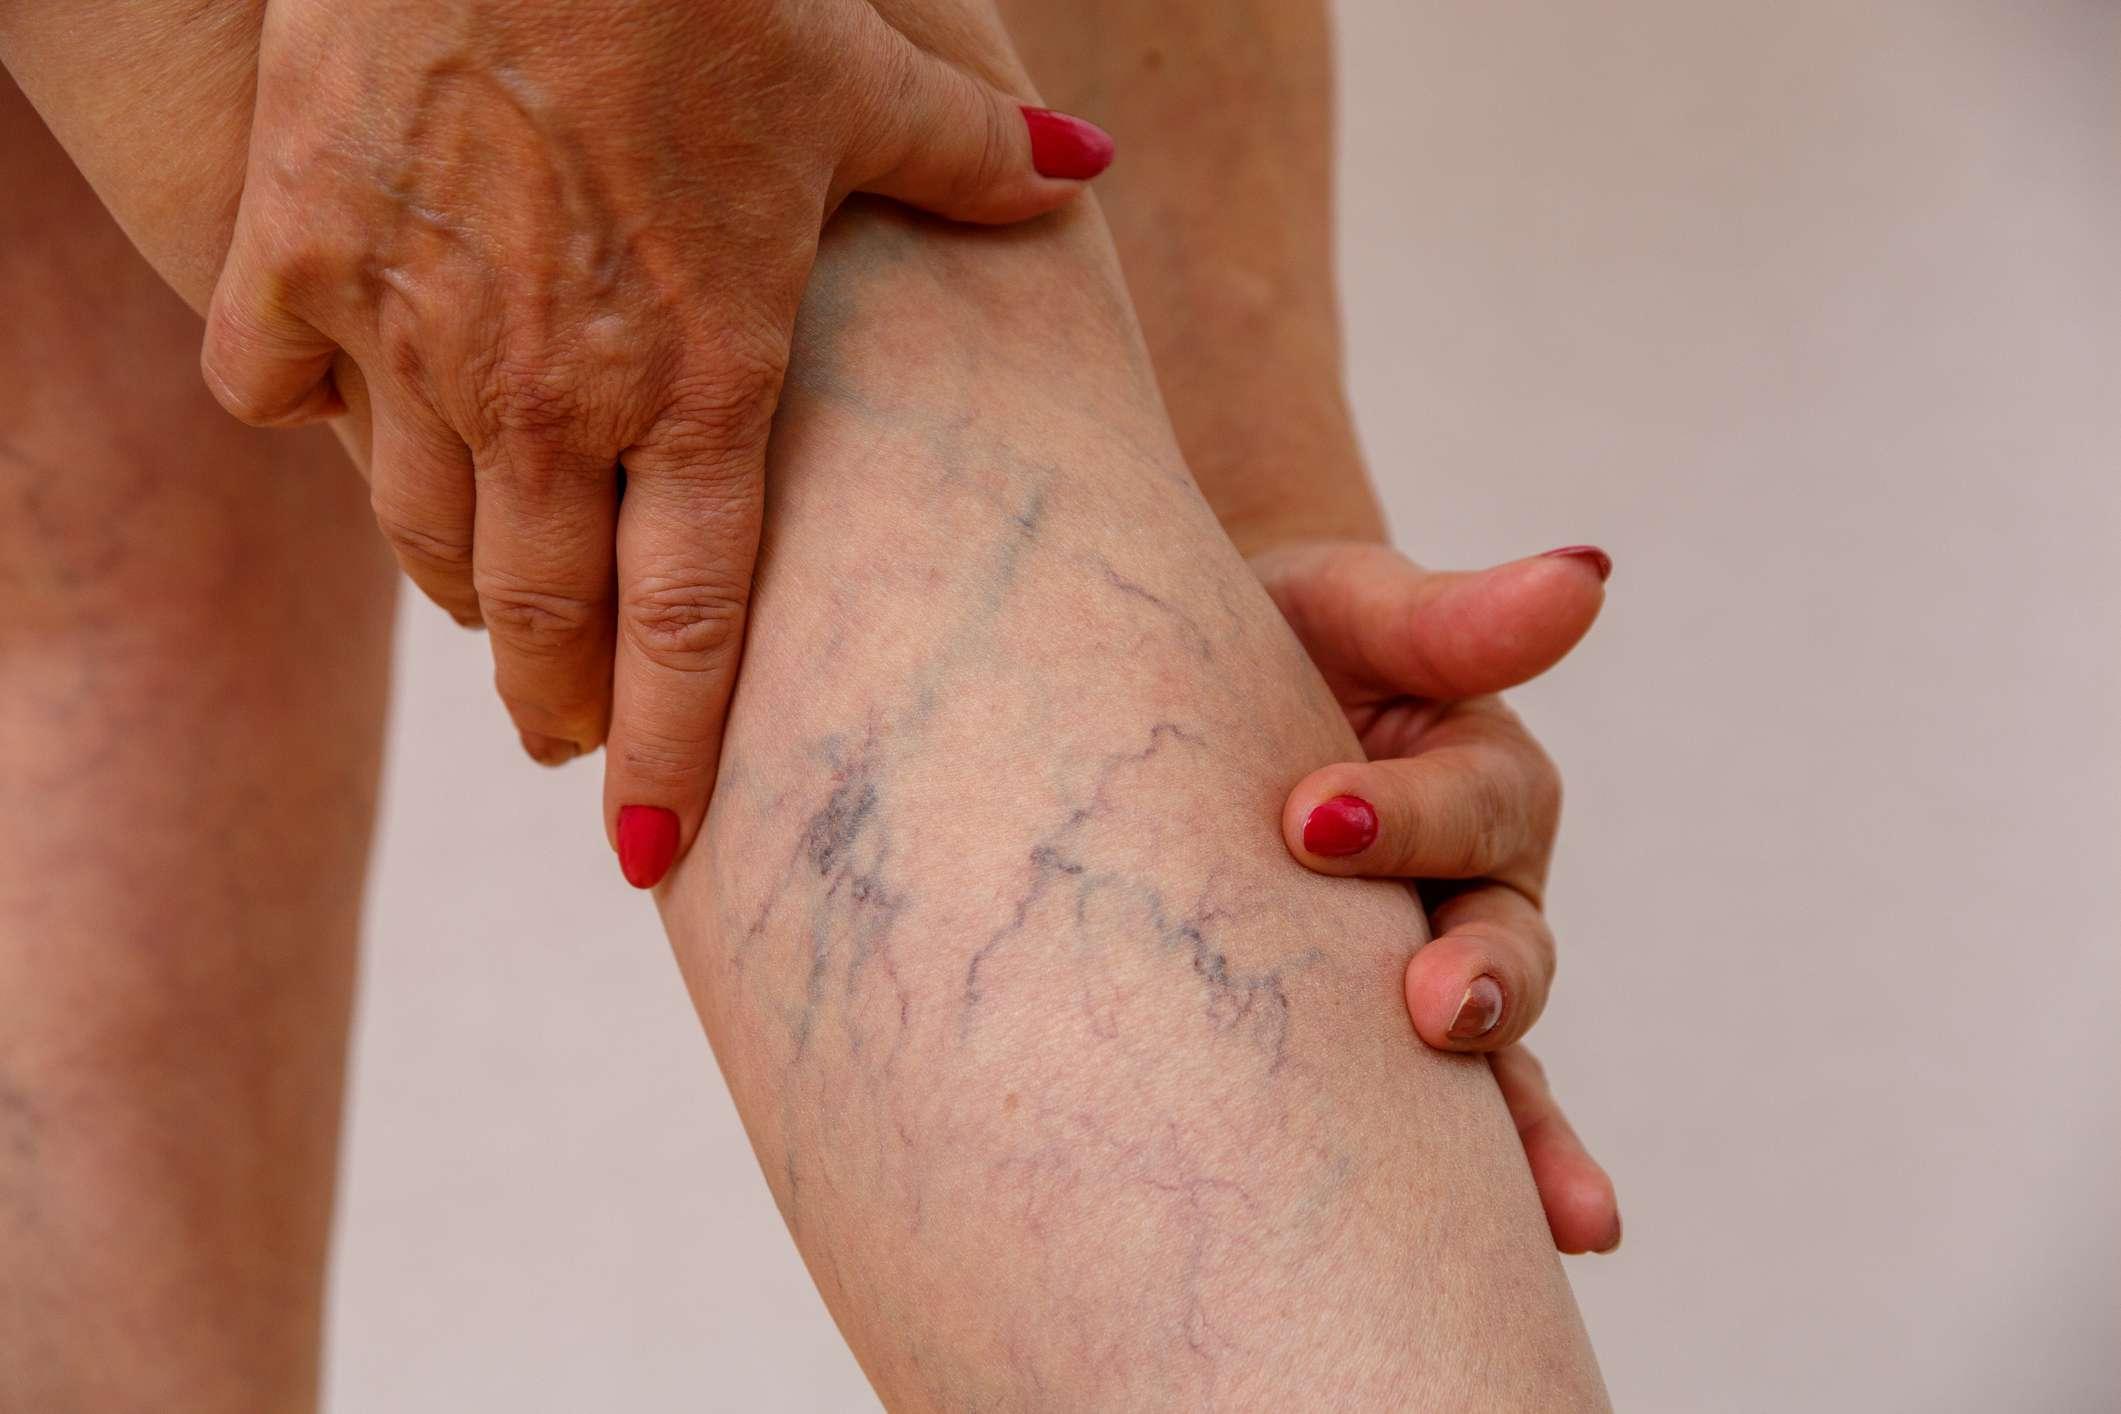 elderly woman shows varicose